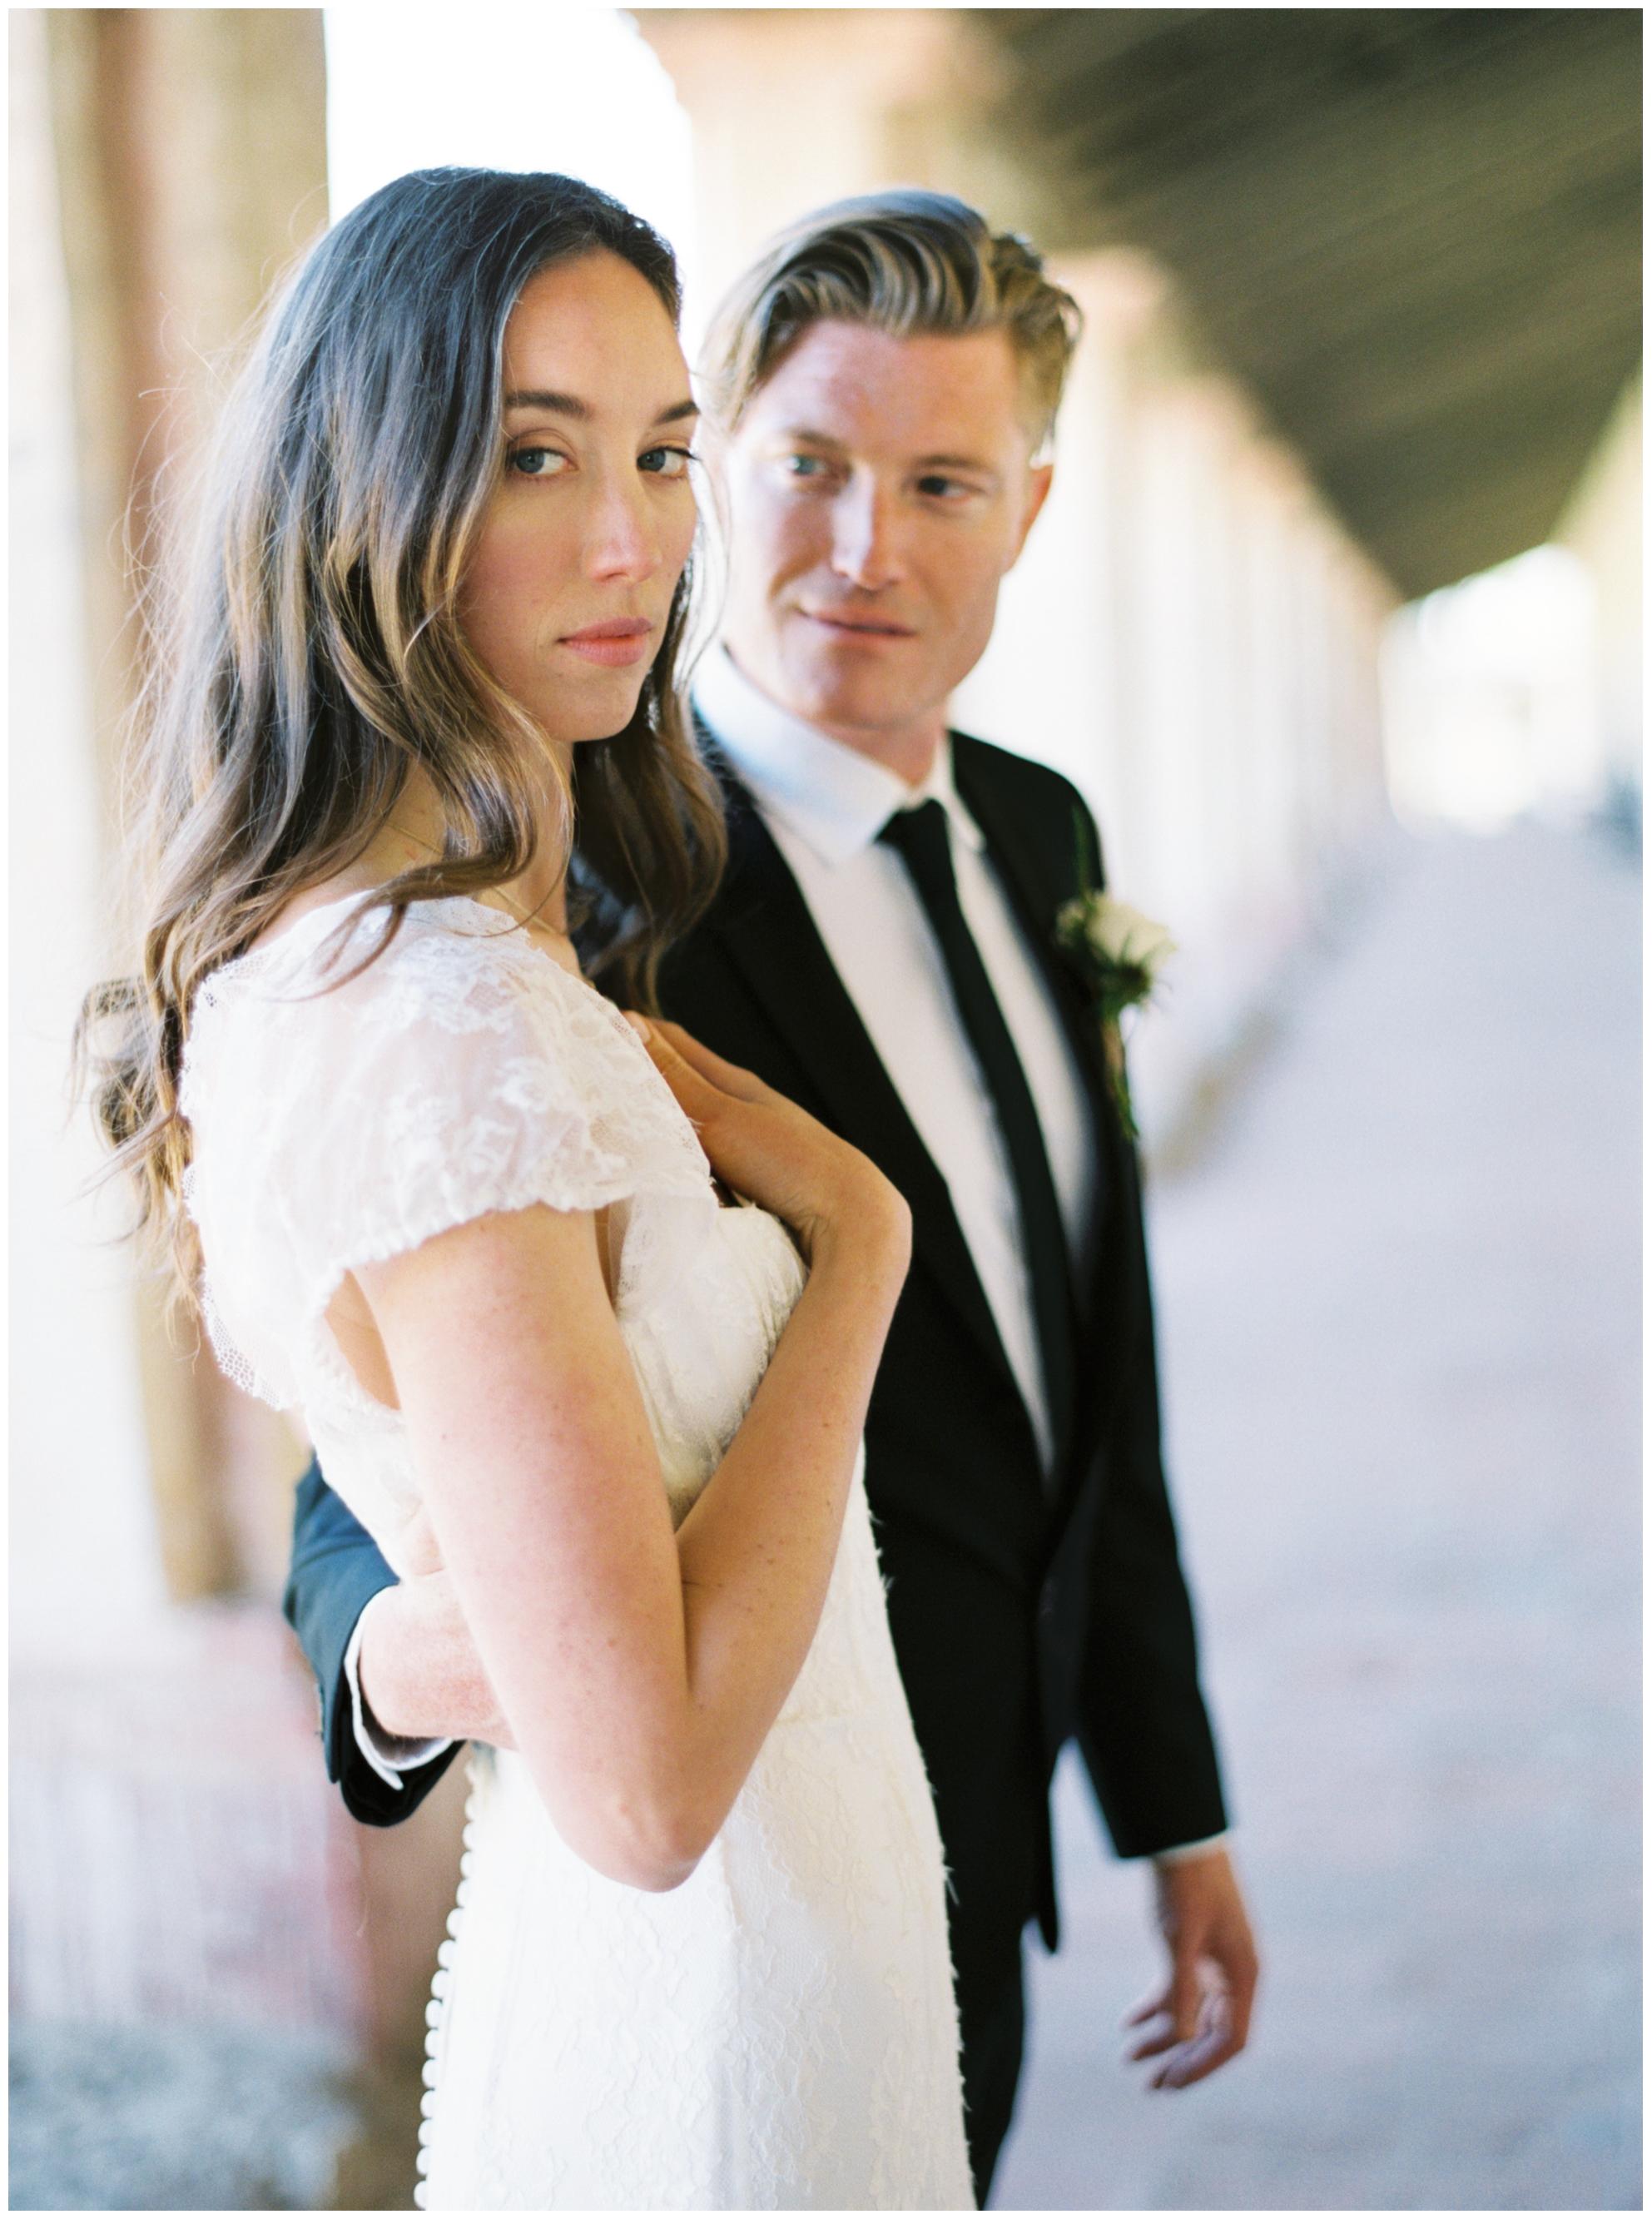 San_Francisco_Wedding_Photographer_Pinnel_Photography_La_Purisima-8.jpg